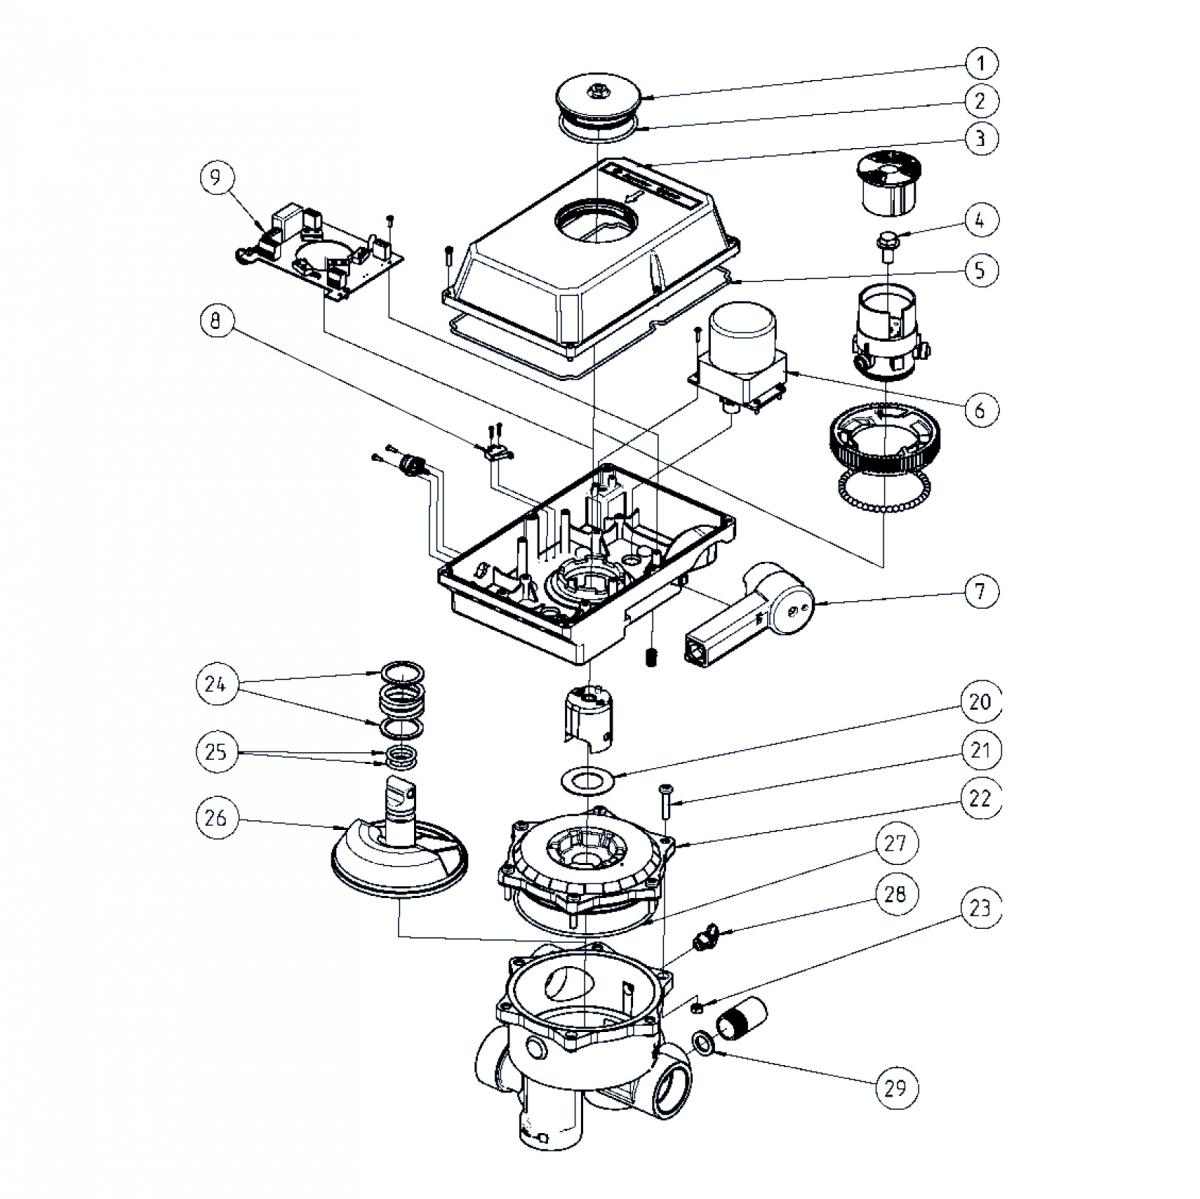 GASKET 3 X 800 MM (SPONGE RUBBER) GASKET 3 X 800 MM (SPONGE RUBBER)